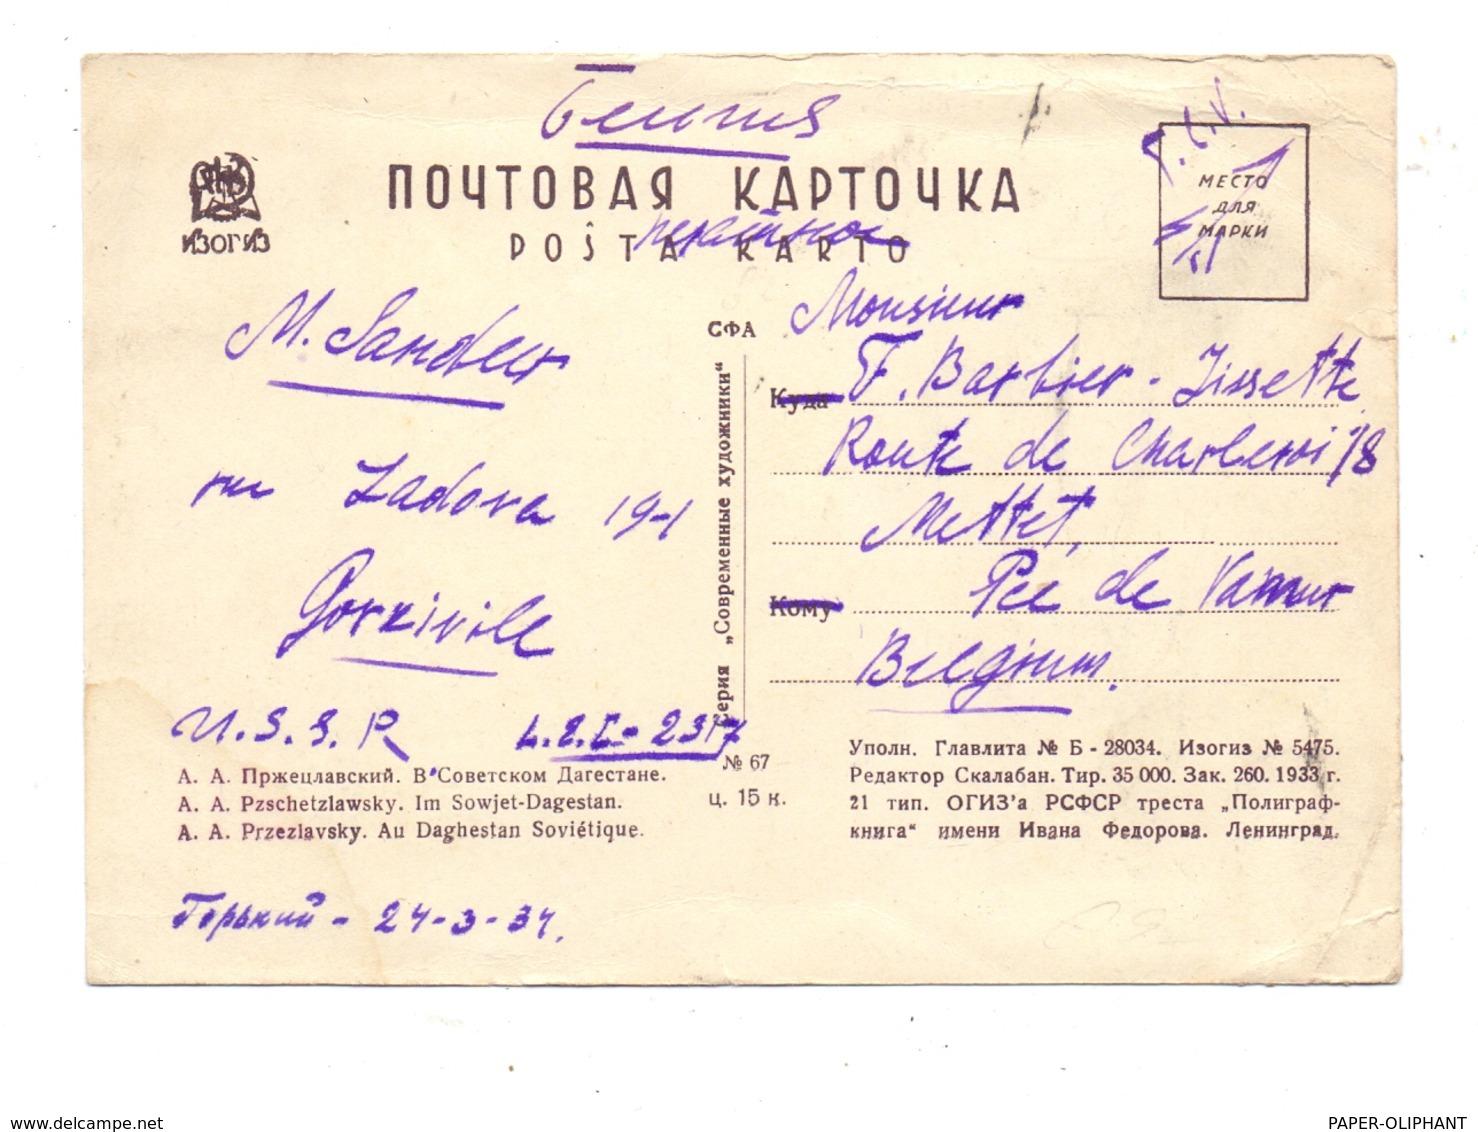 DAGESTAN, Künstler-Karte Przezlavsky, 1933 - Russland